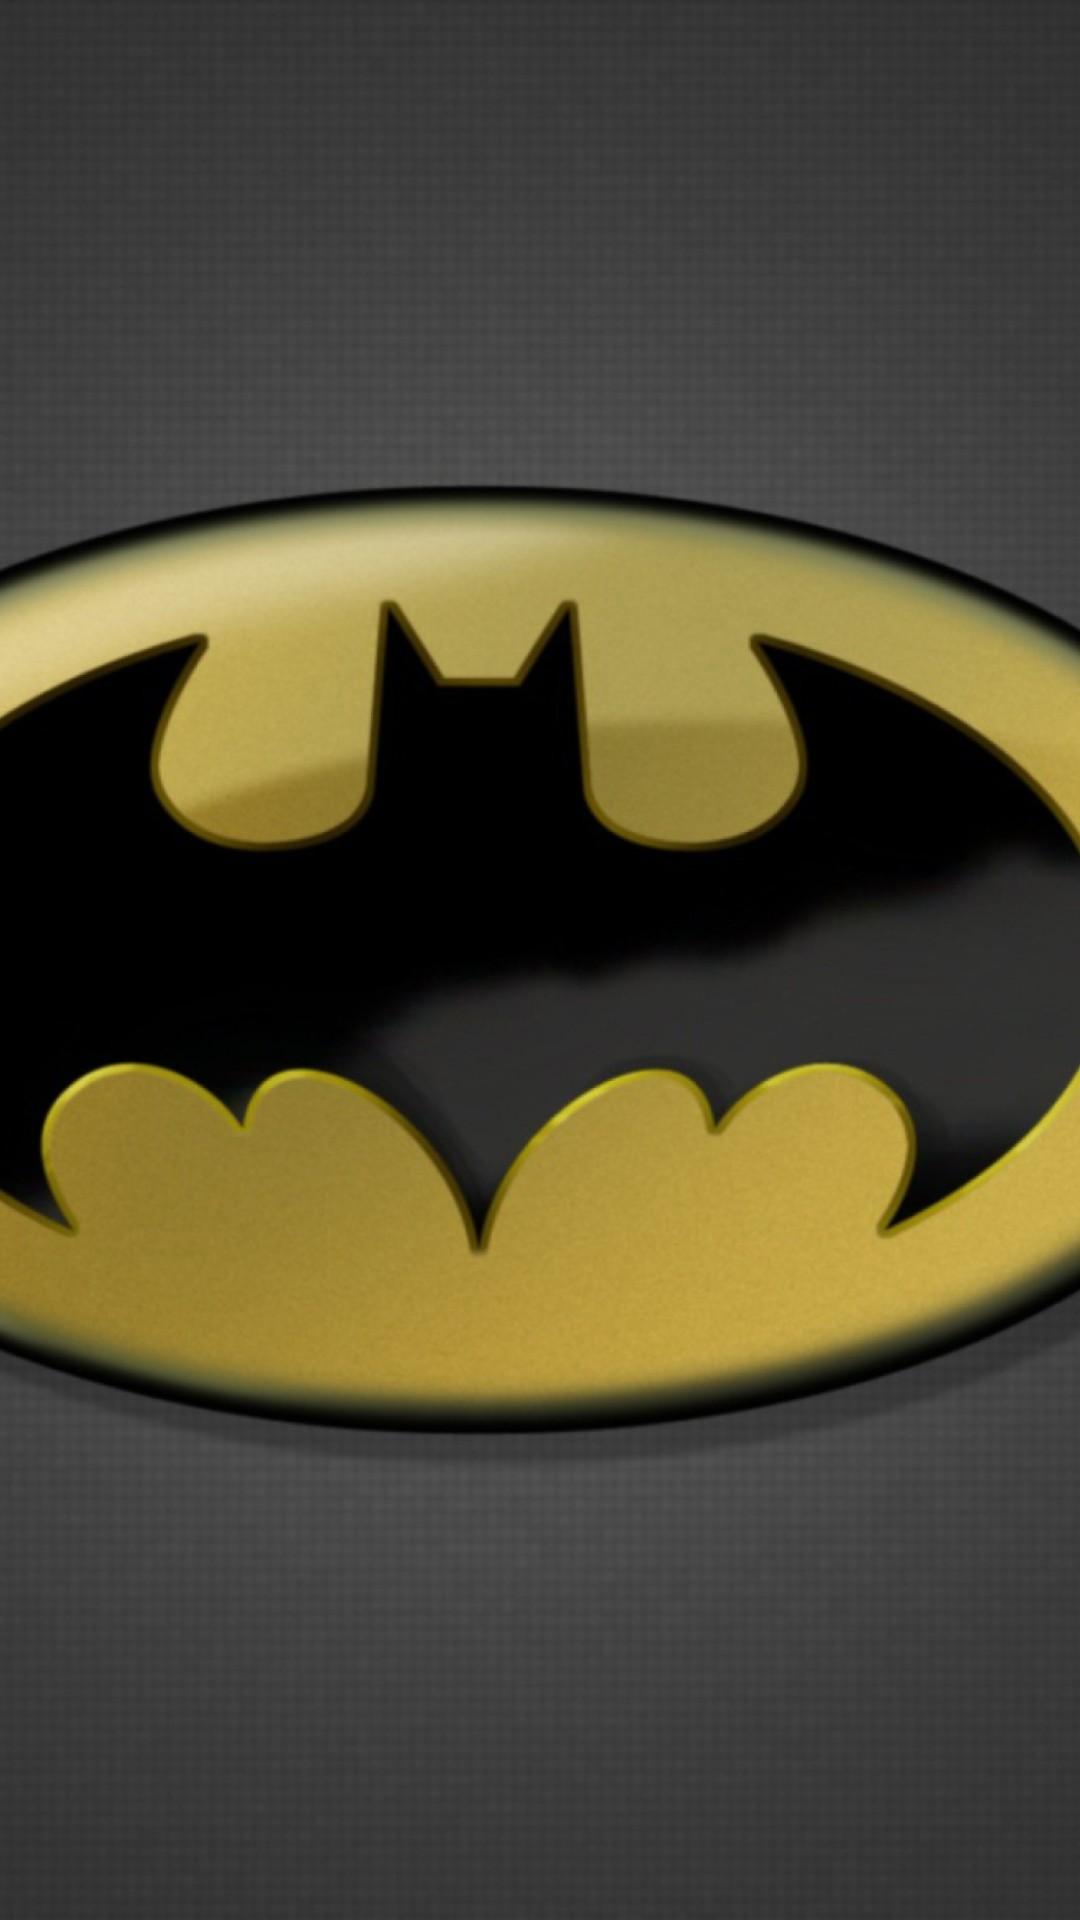 Batman Logo 1080×1920.